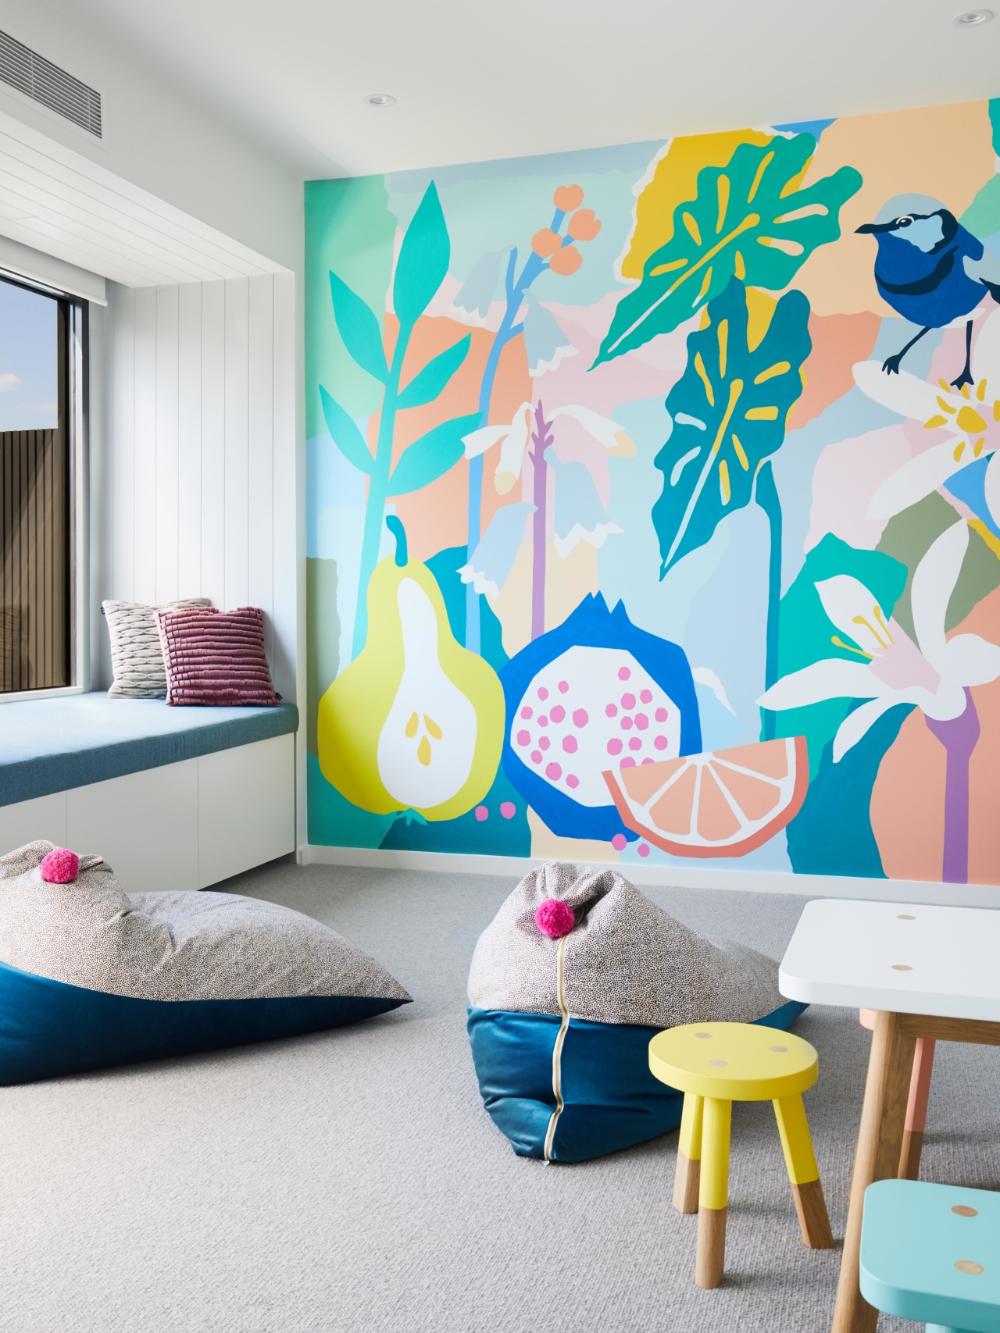 Photo of Architect & interior designer collab on 'curved' house – The Interiors Addict